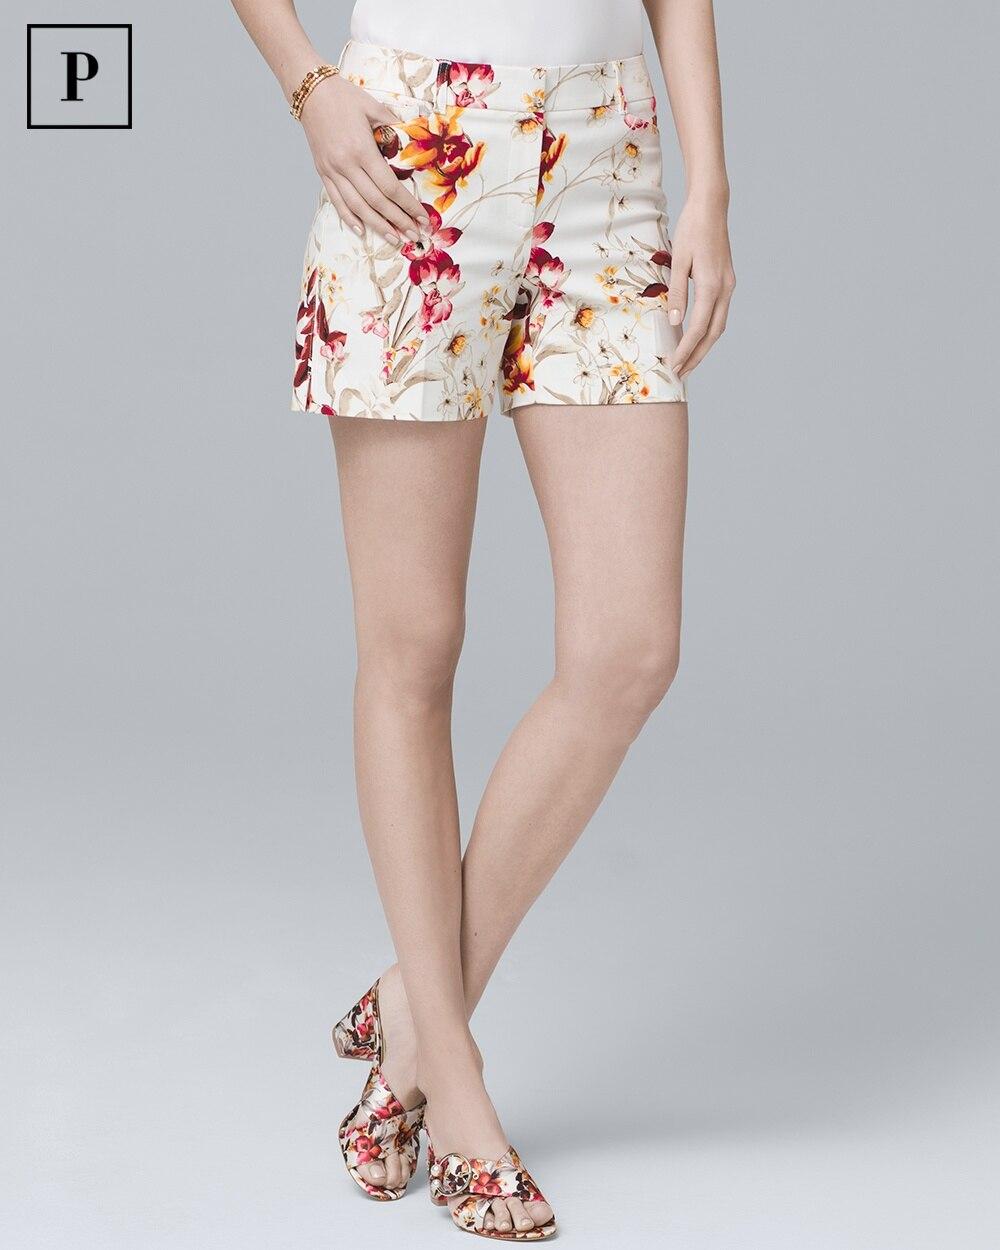 3ffb3a283d4e3 Petite 5-Inch Floral Coastal Stretch Shorts - White House Black Market